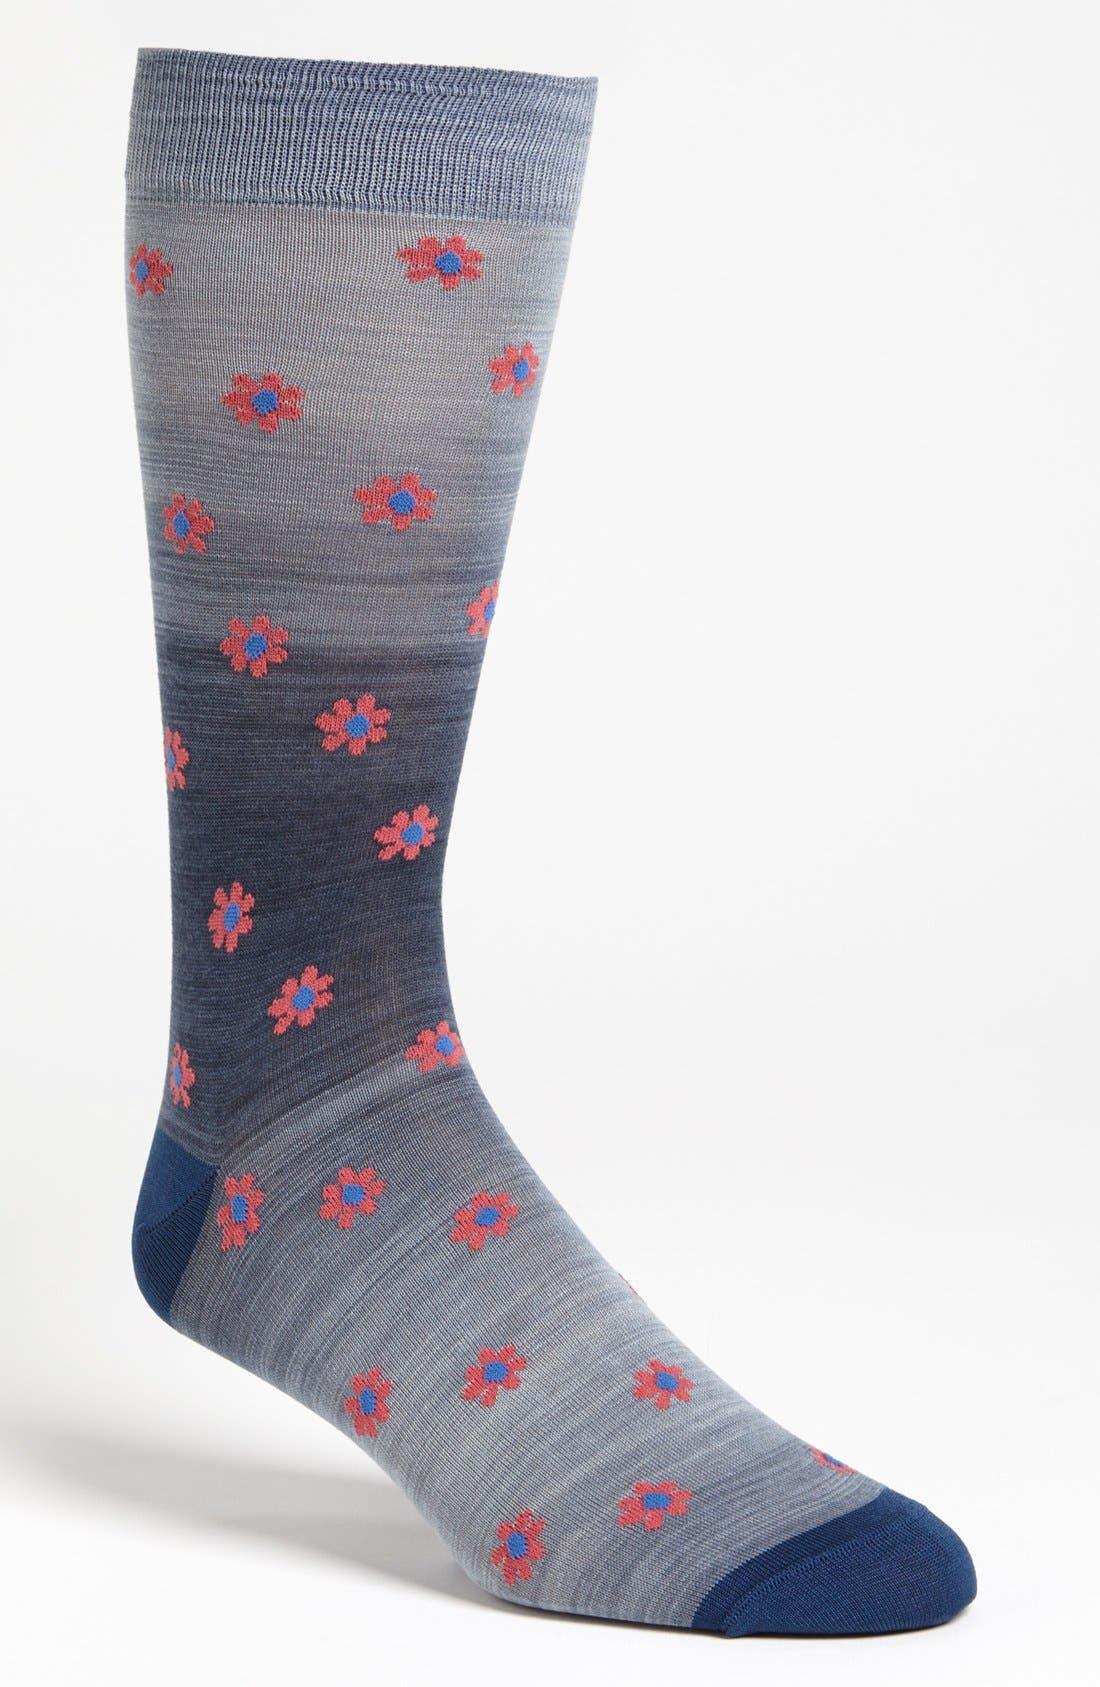 Alternate Image 1 Selected - Marcoliani 'Delave' Floral Socks